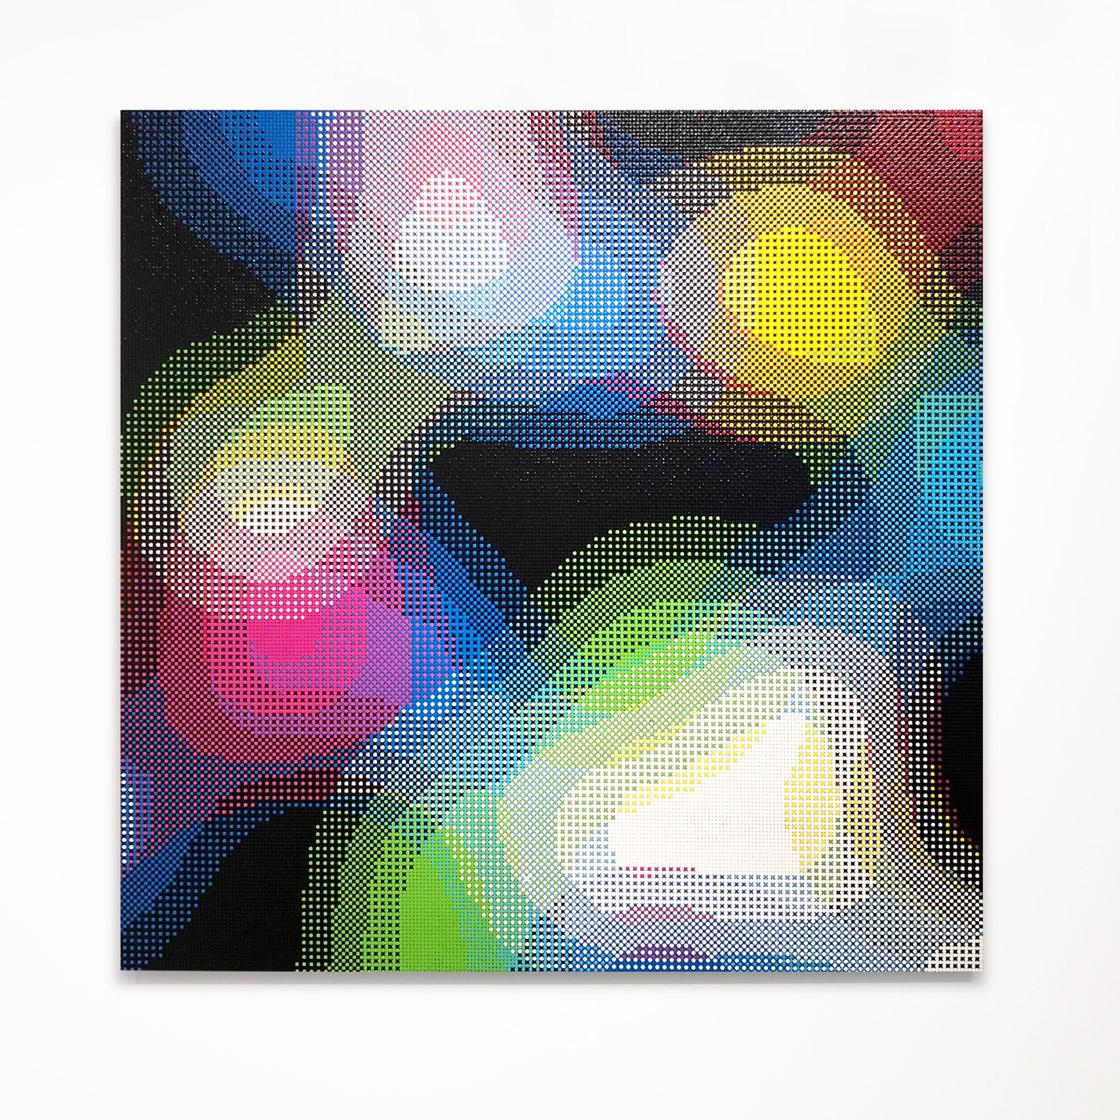 William Betts, Passage, ColorSpace, XVI, 60x60, 2017